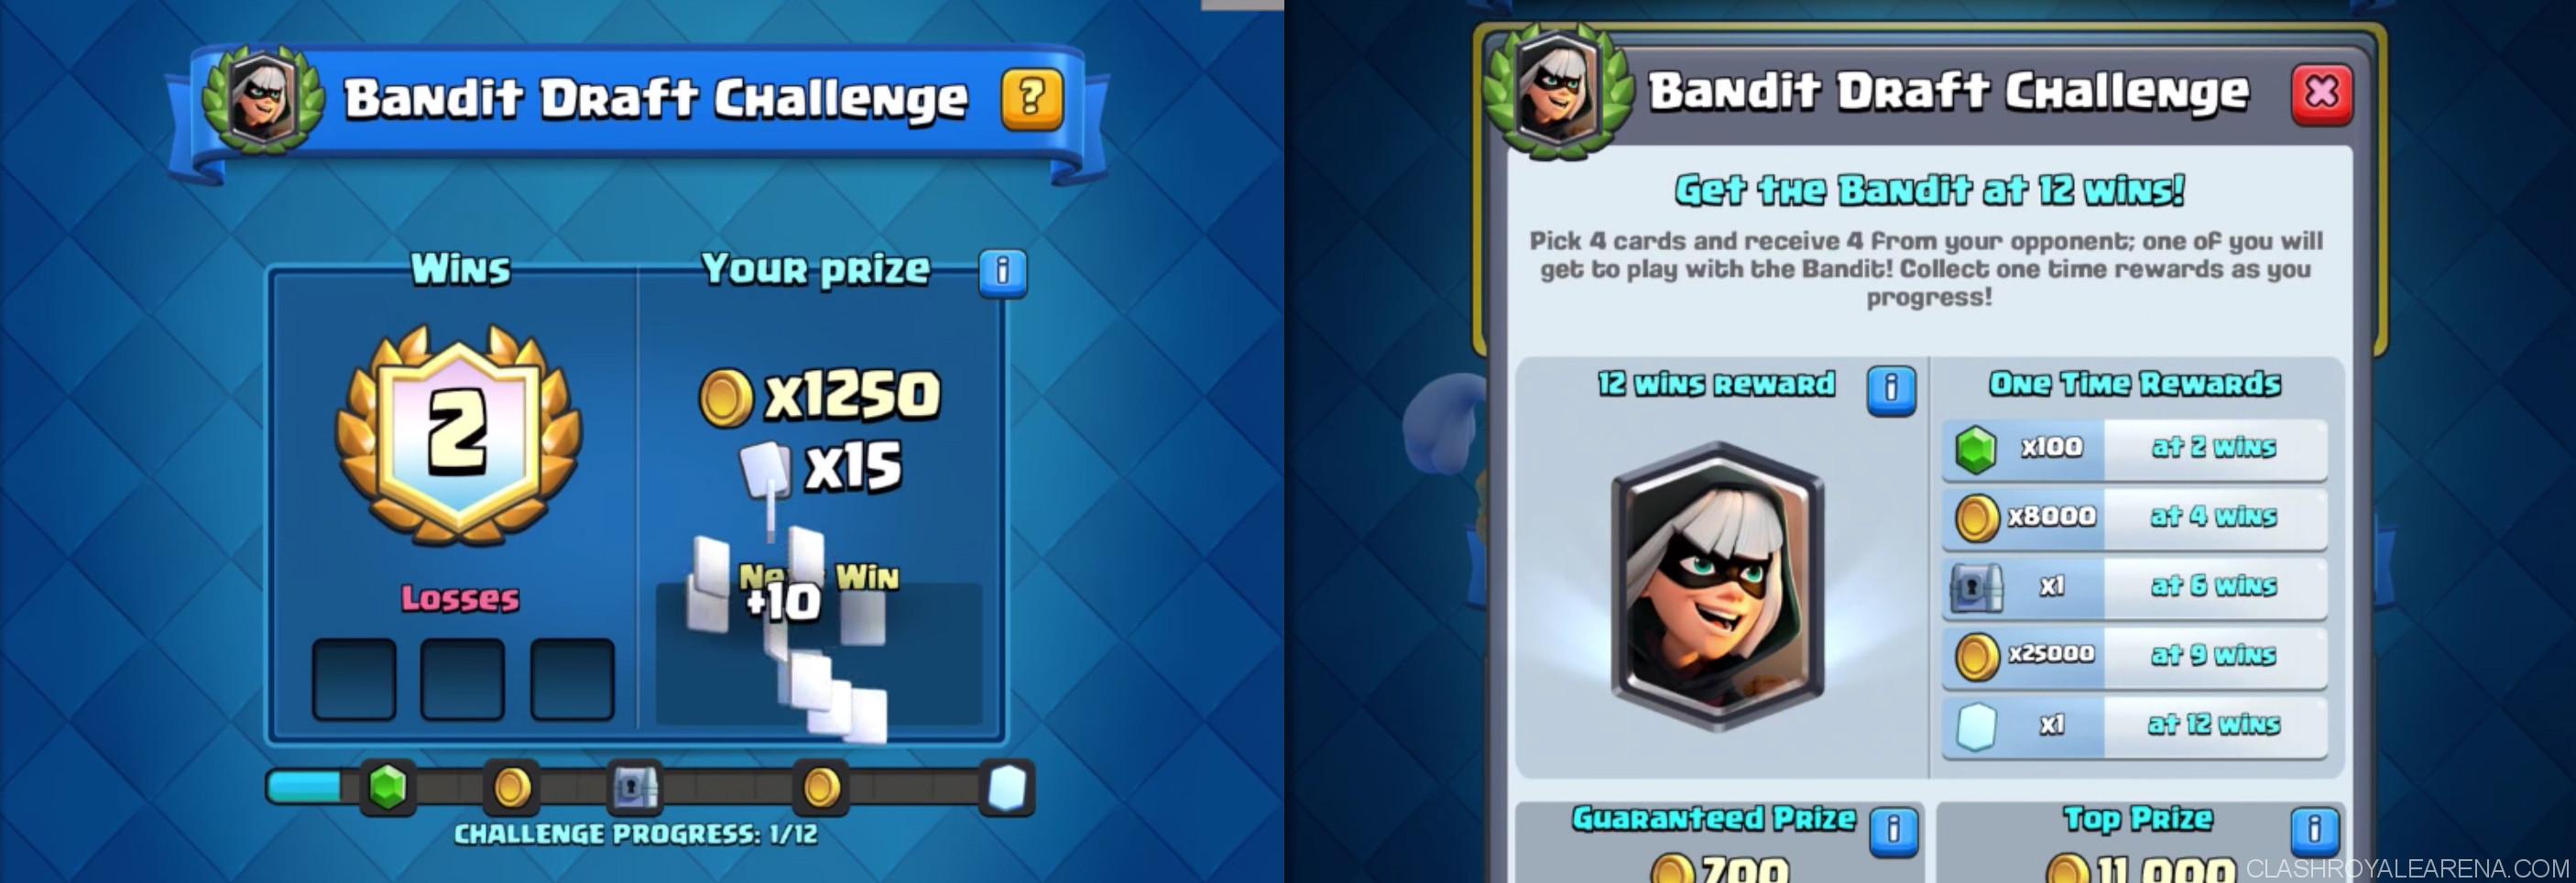 Clash Royale Bandit Draft Challenge